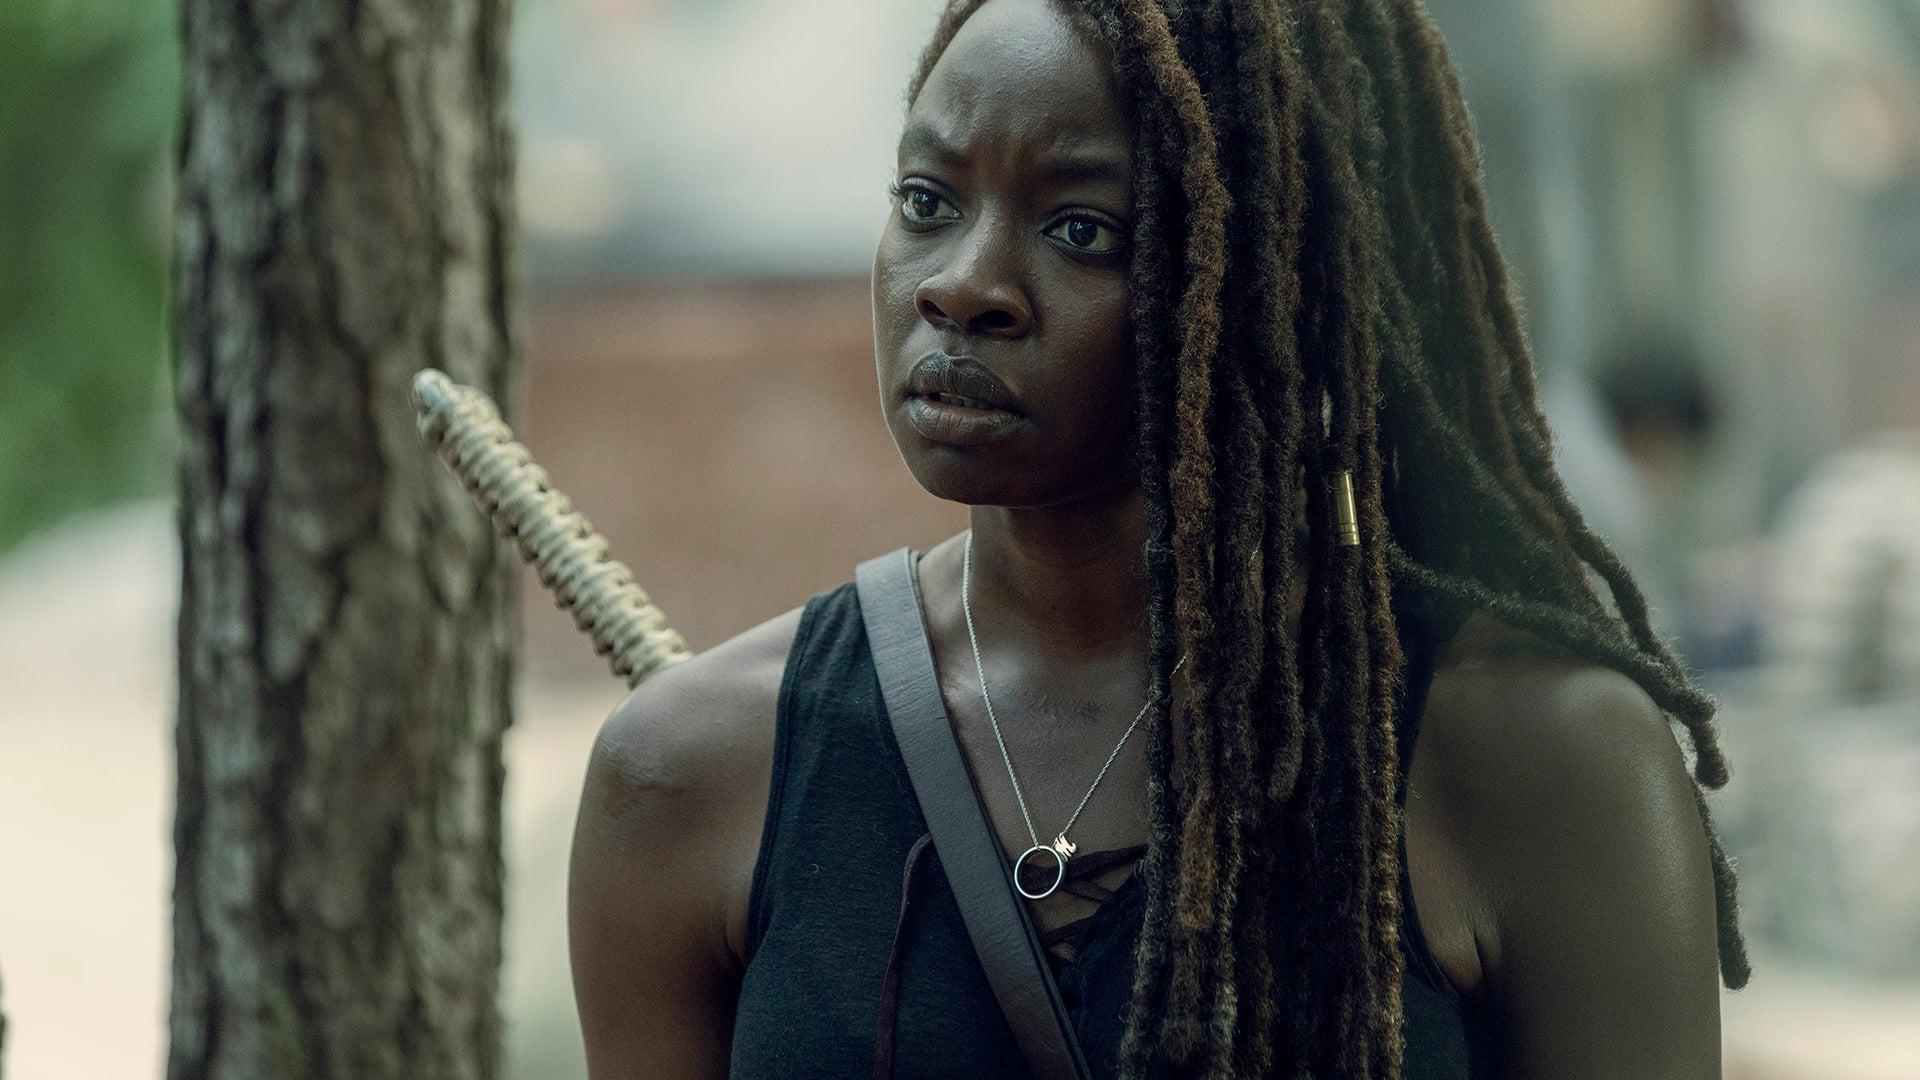 The Walking Dead: Danai Gurira confirms she is leaving the